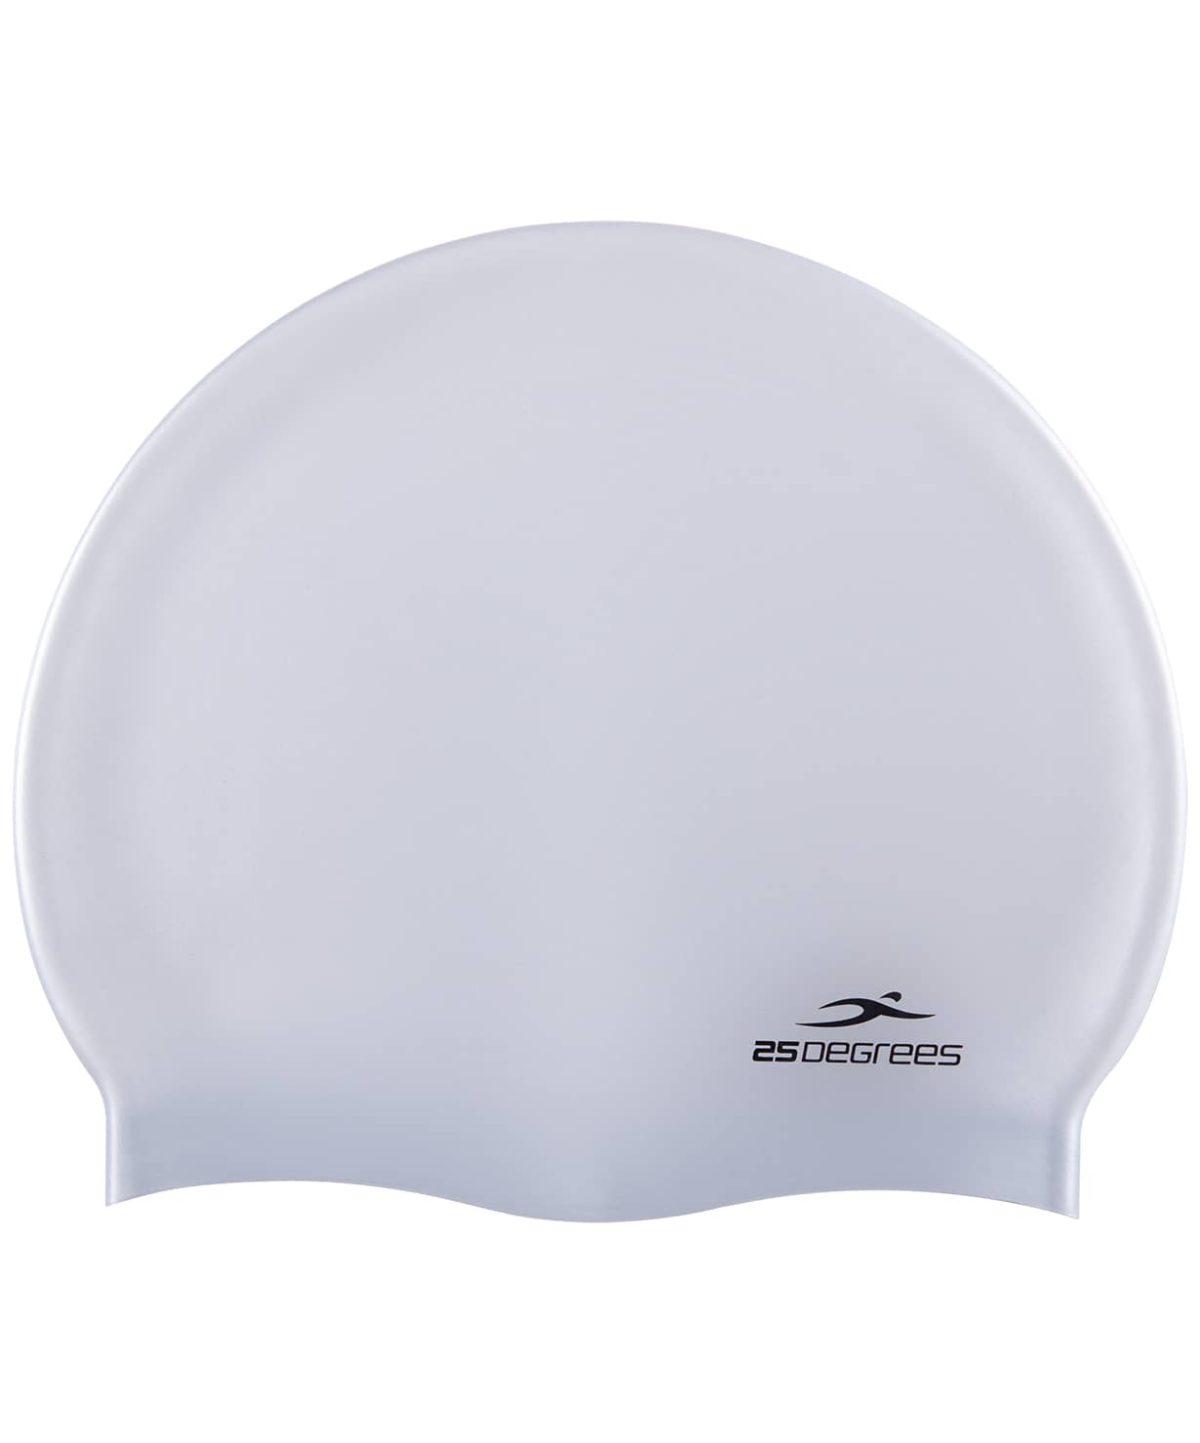 25DEGREES Шапочка для плавания Nuance, силикон 25D15-NU-20-30: серебристый - 1